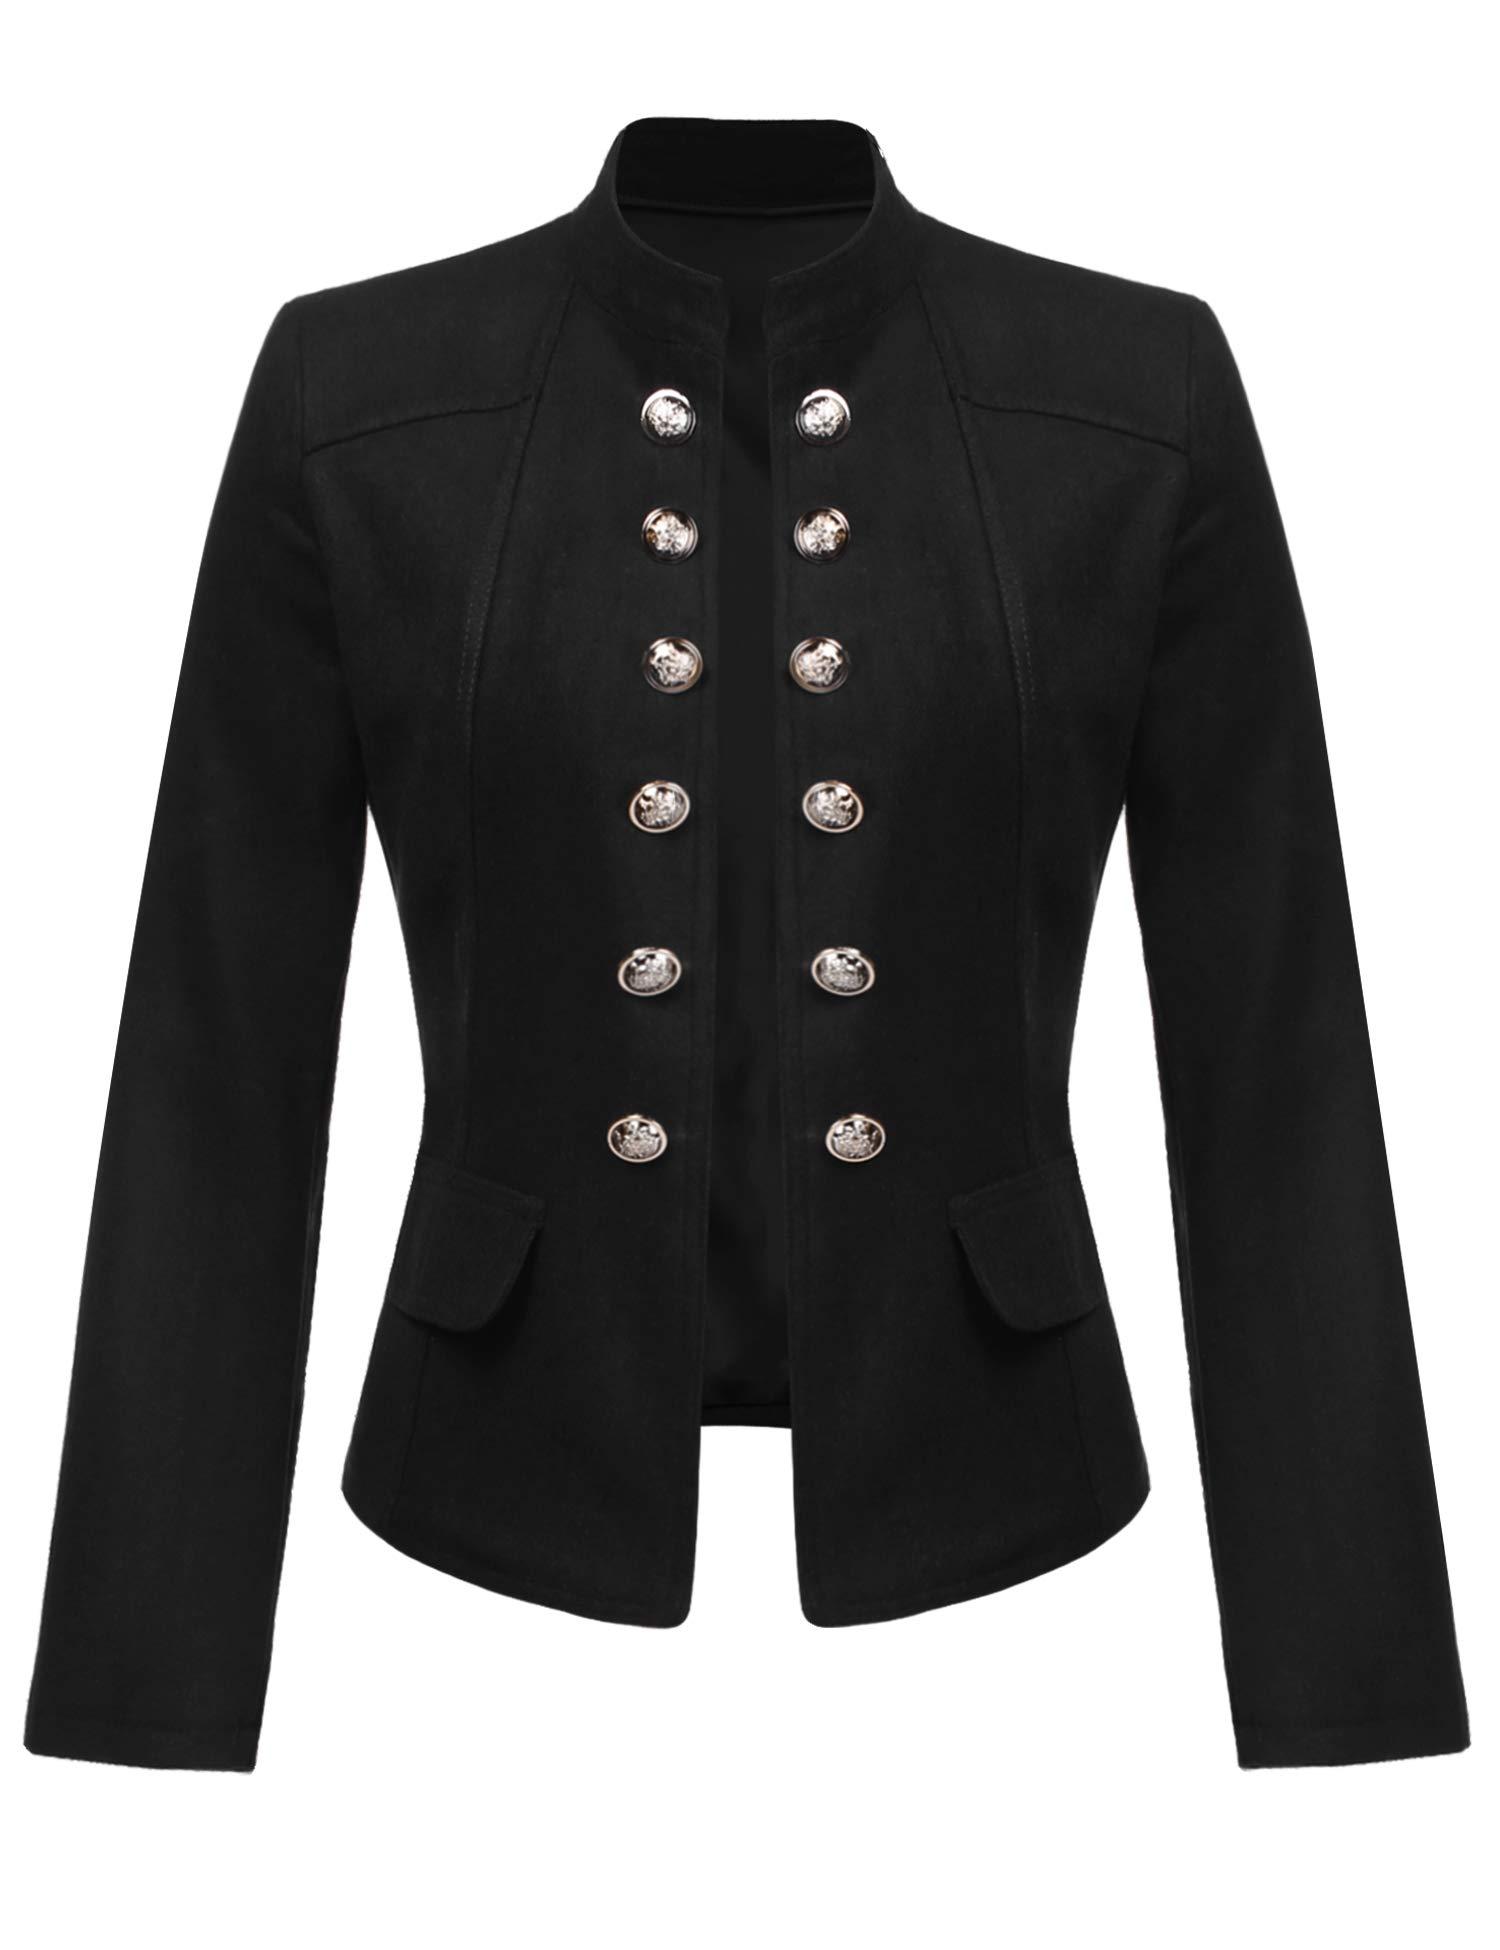 ELESOL Women's Vintage Button Front Open-Front Blazer Black M